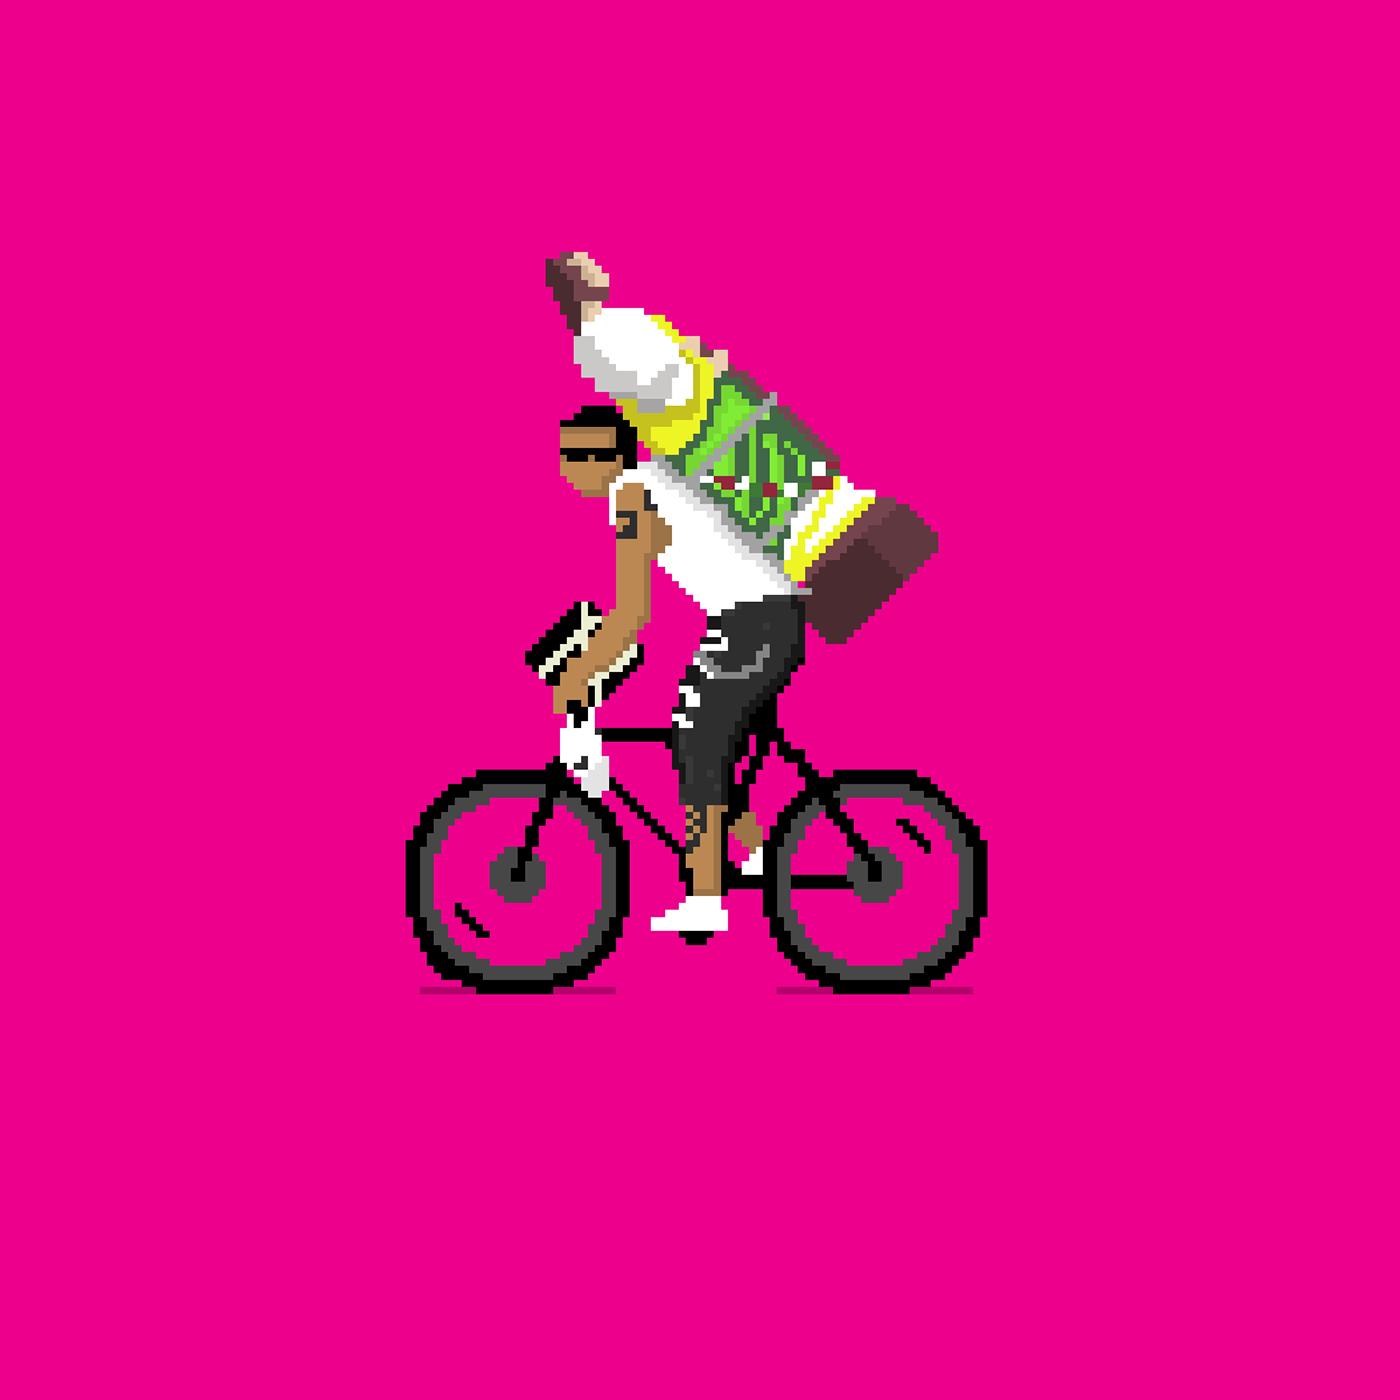 pixel pixels 8 bit illustrations memes Meme pixel draw  pixel art easy art games Handmaid's Tale